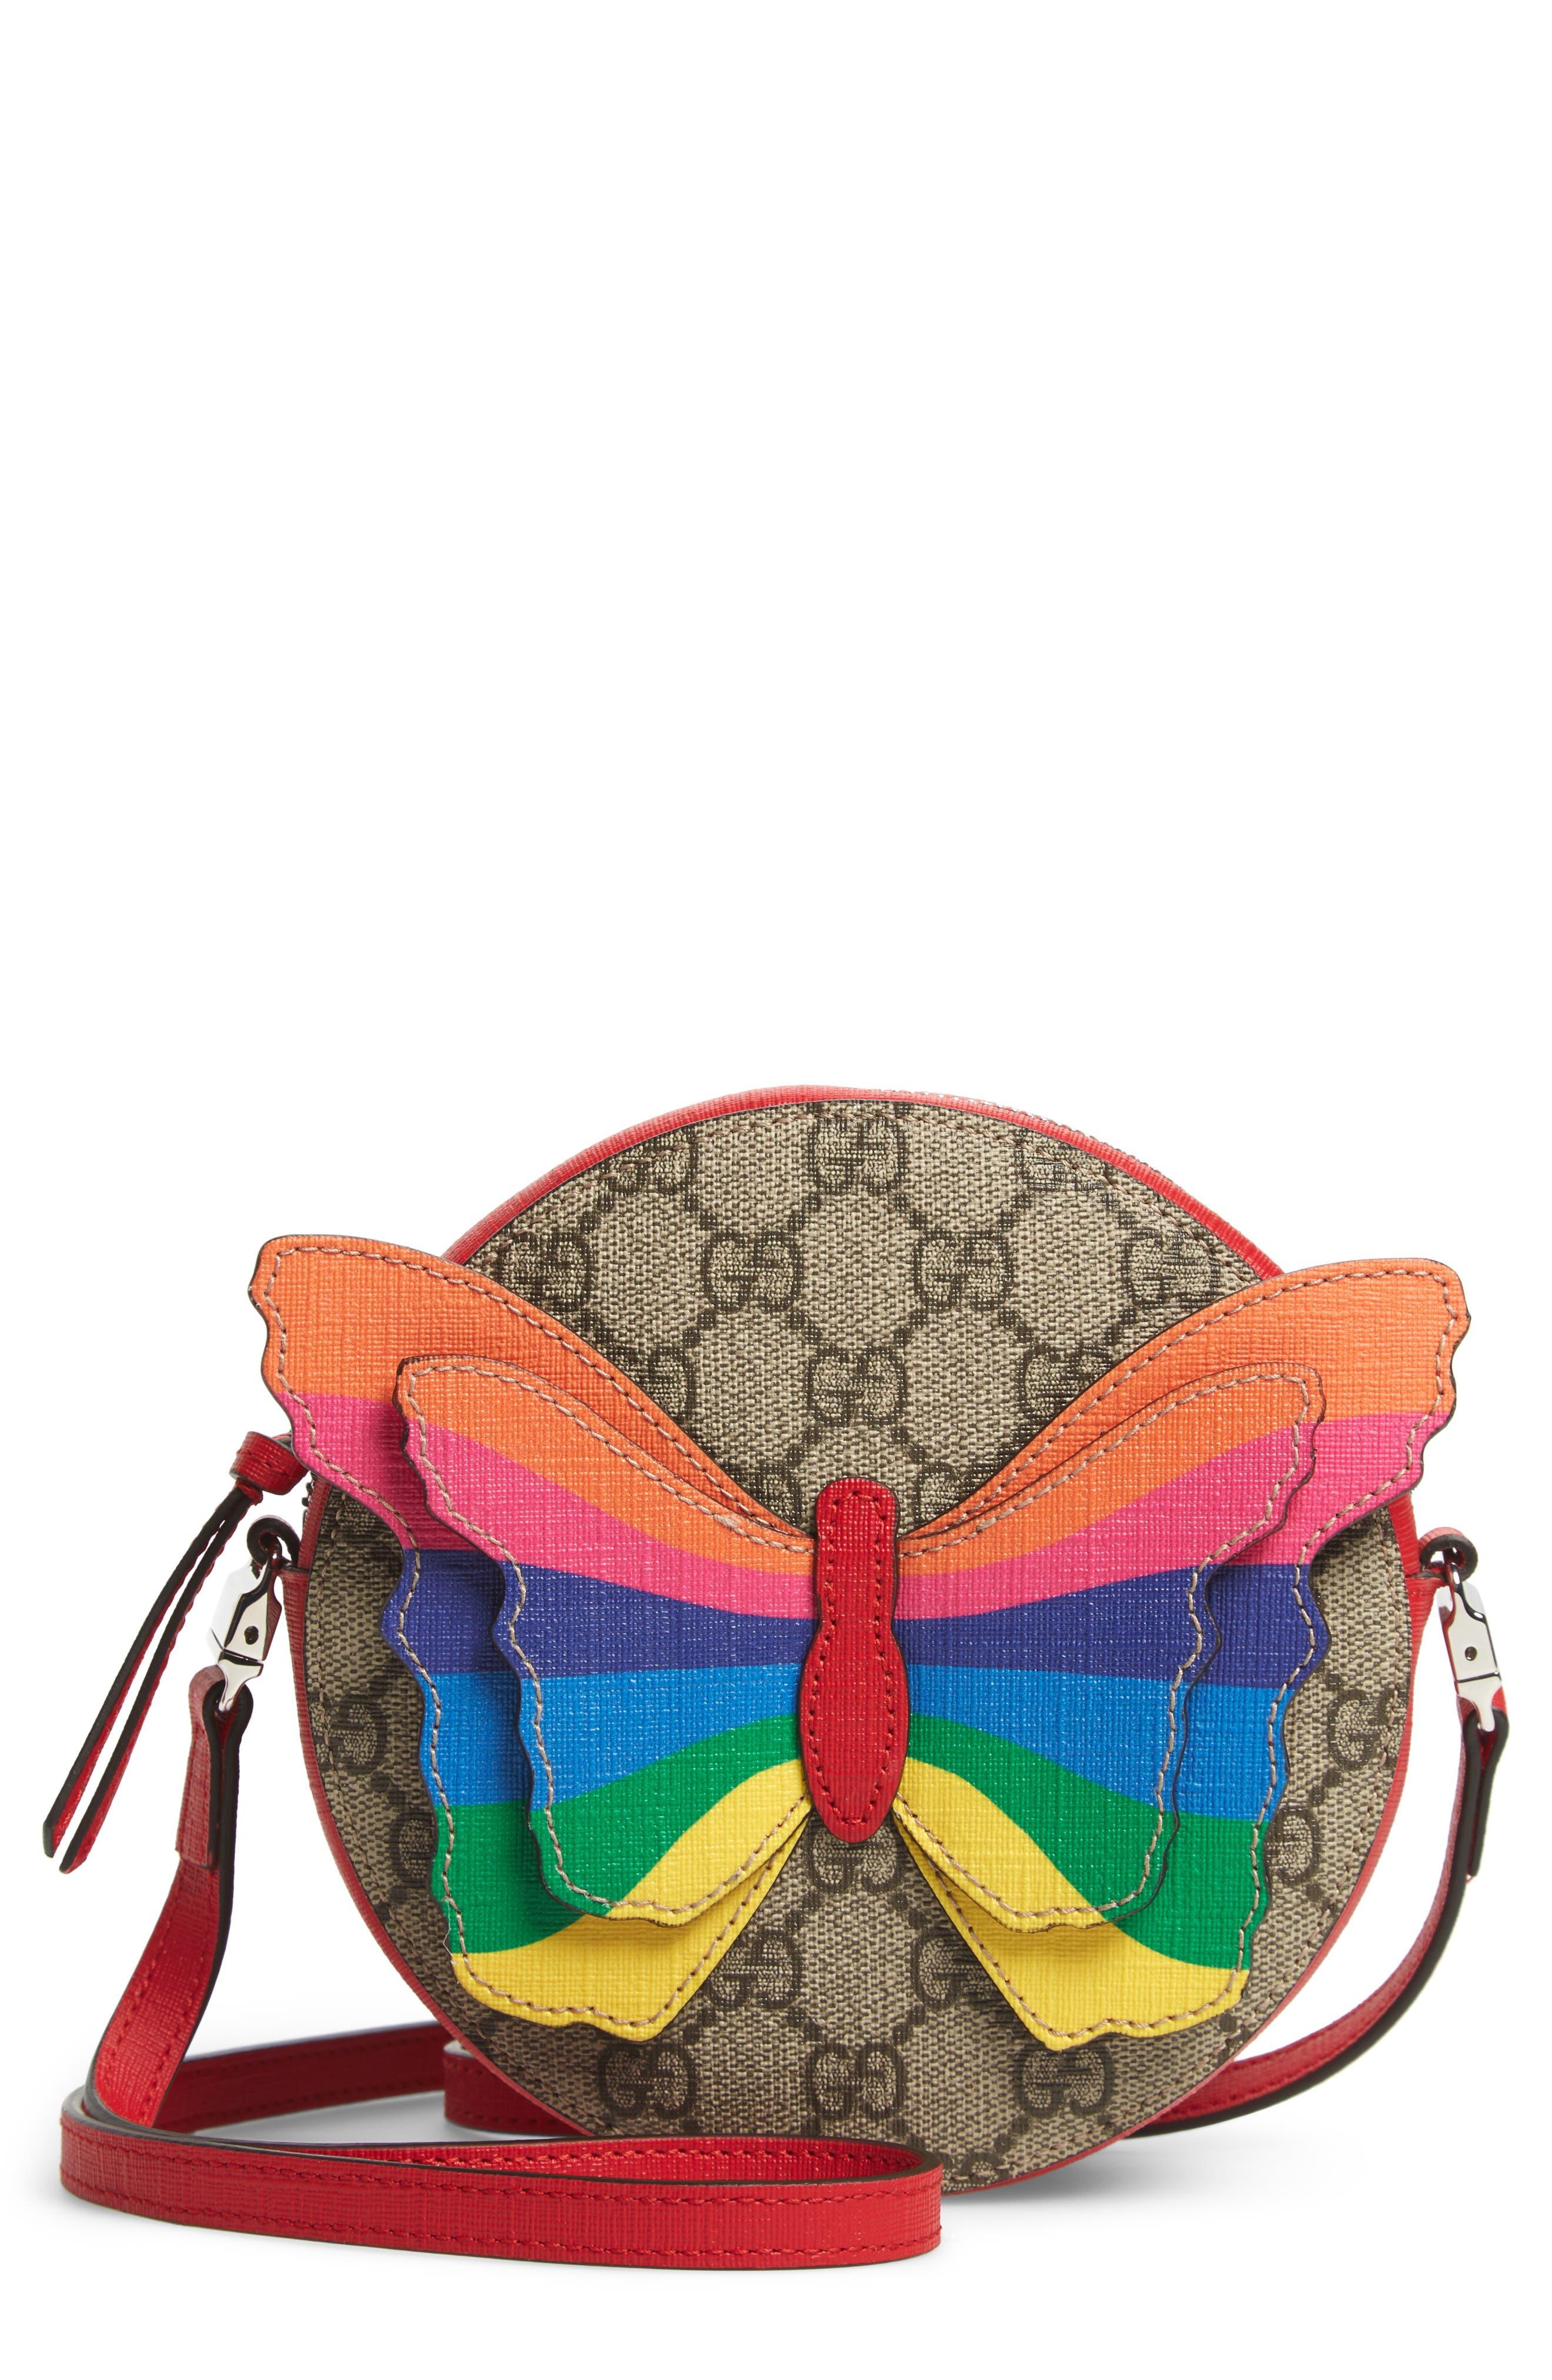 GUCCI,                             GG Supreme Rainbow Butterfly Crossbody Bag,                             Main thumbnail 1, color,                             BROWN MULTI